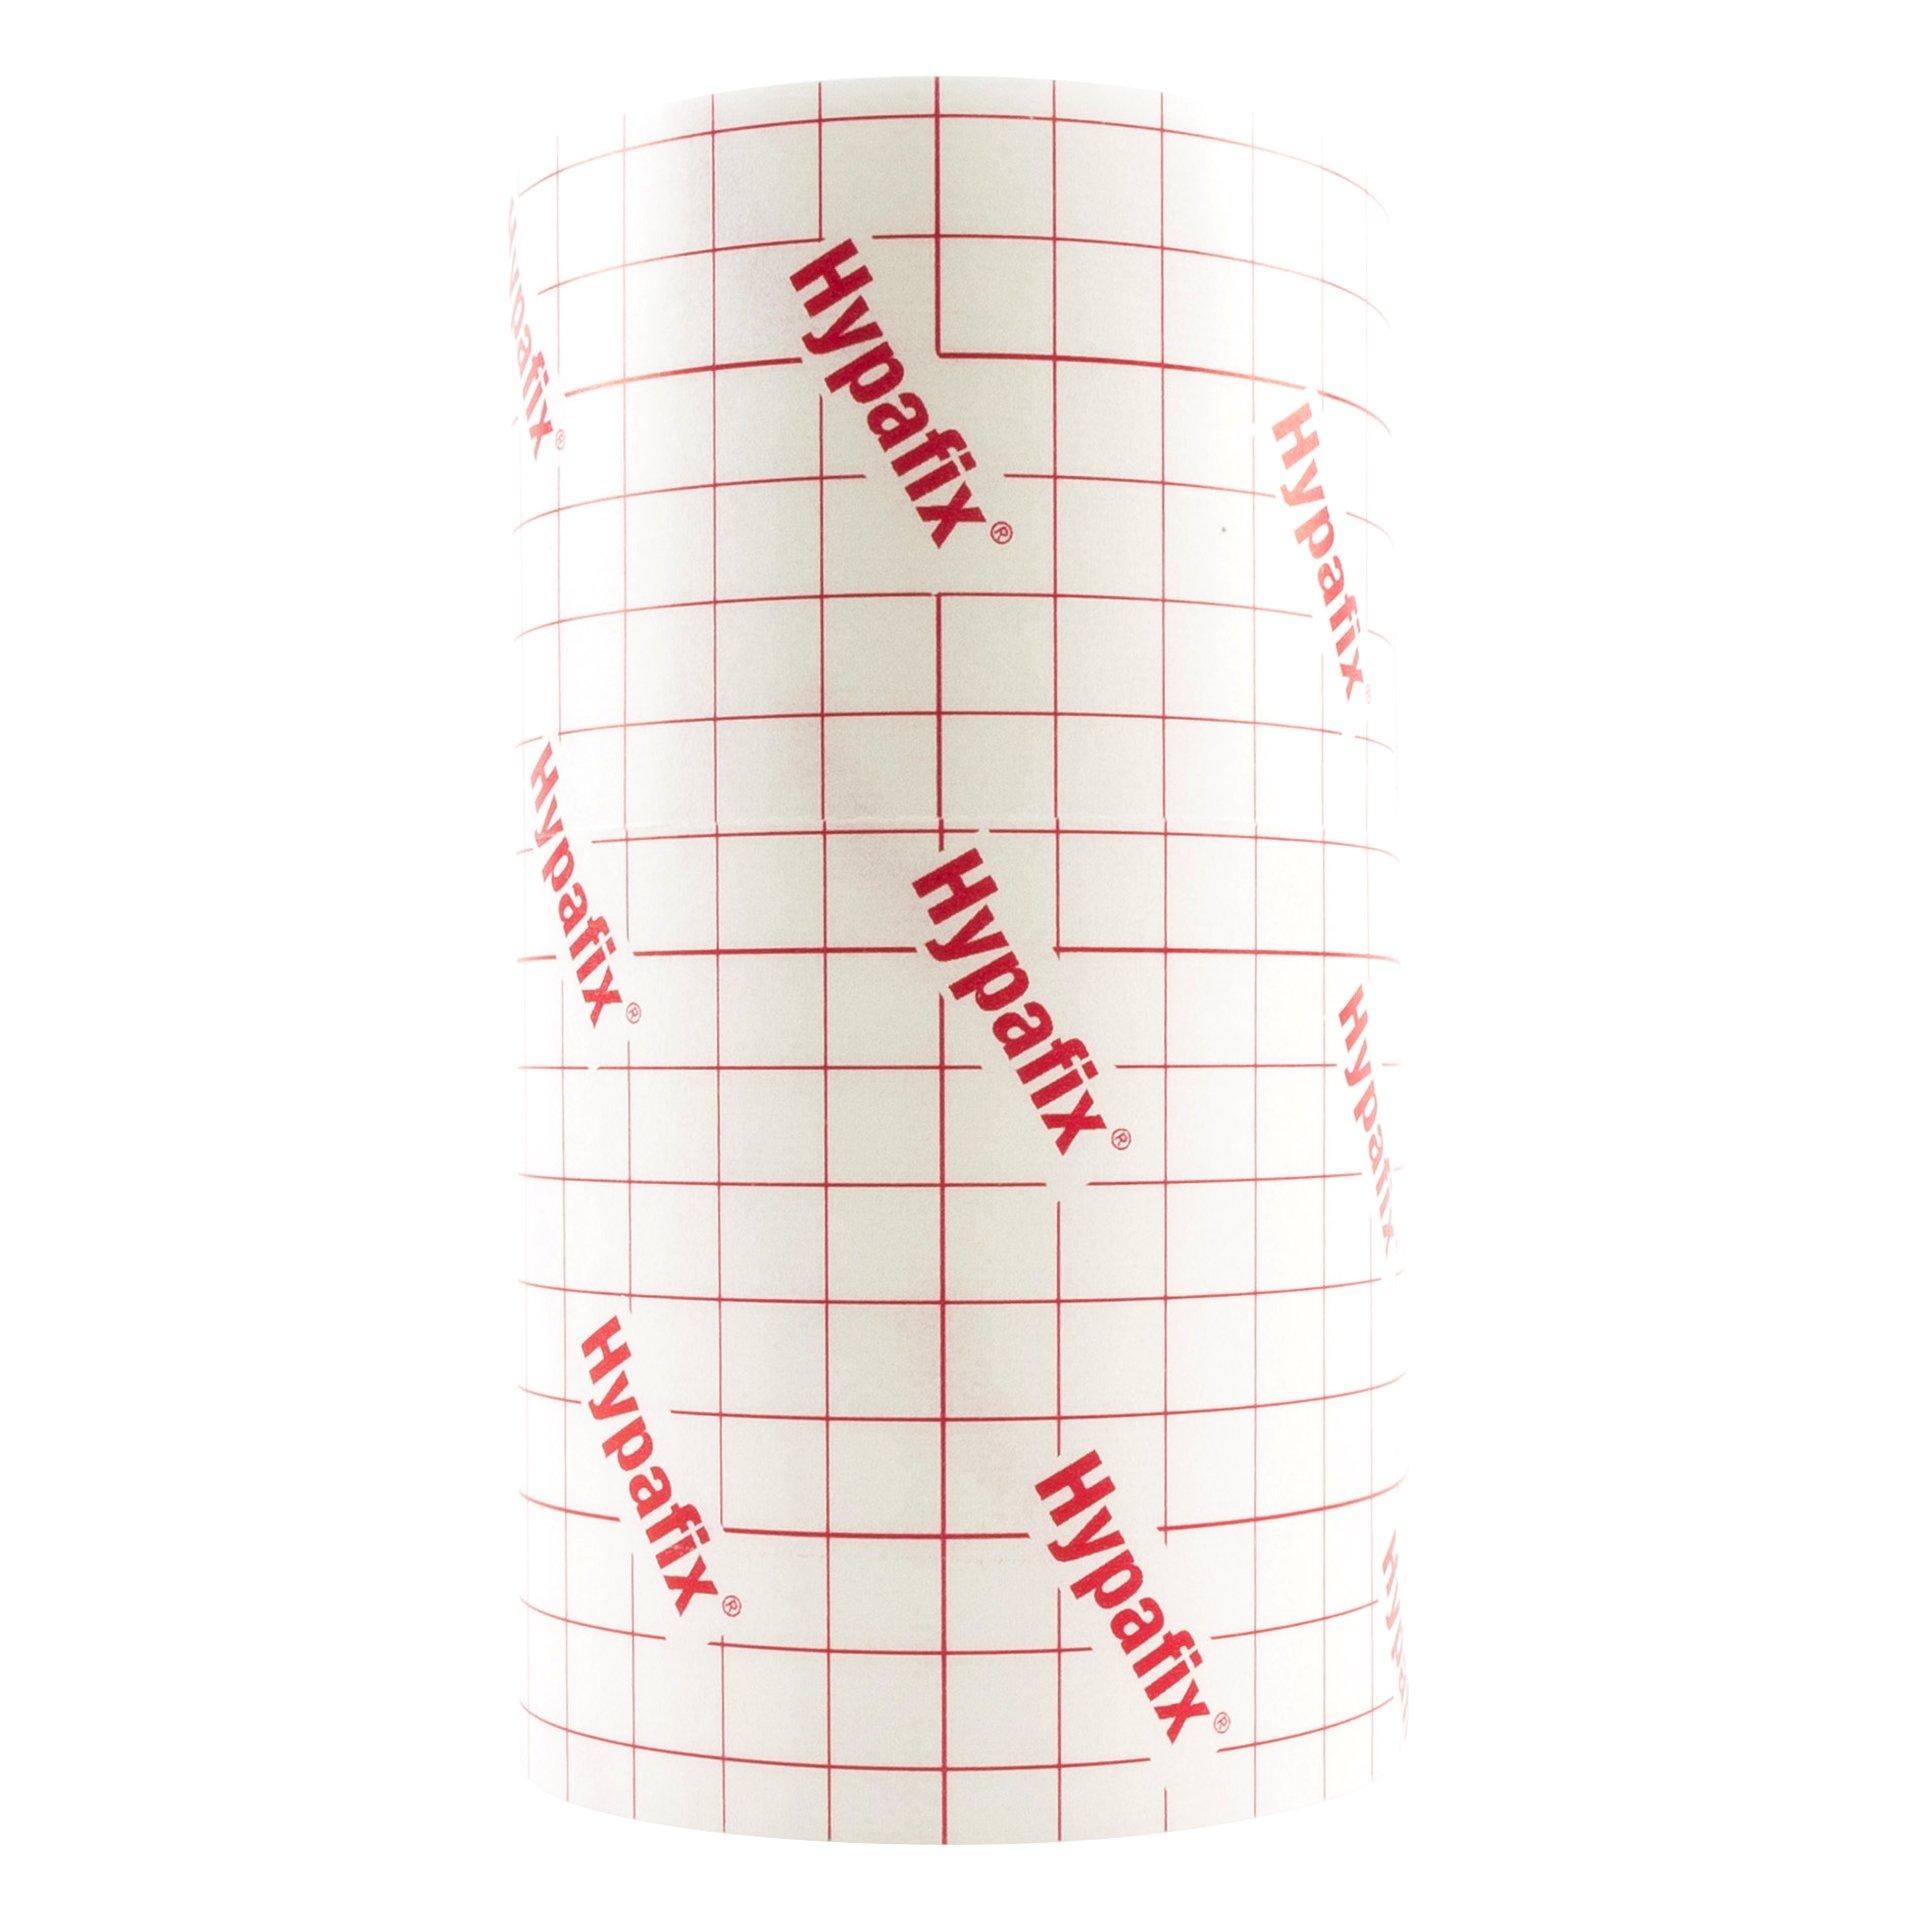 Hypafix Dressing Retention Tape 6'' x 10 yd Roll QTY: 1